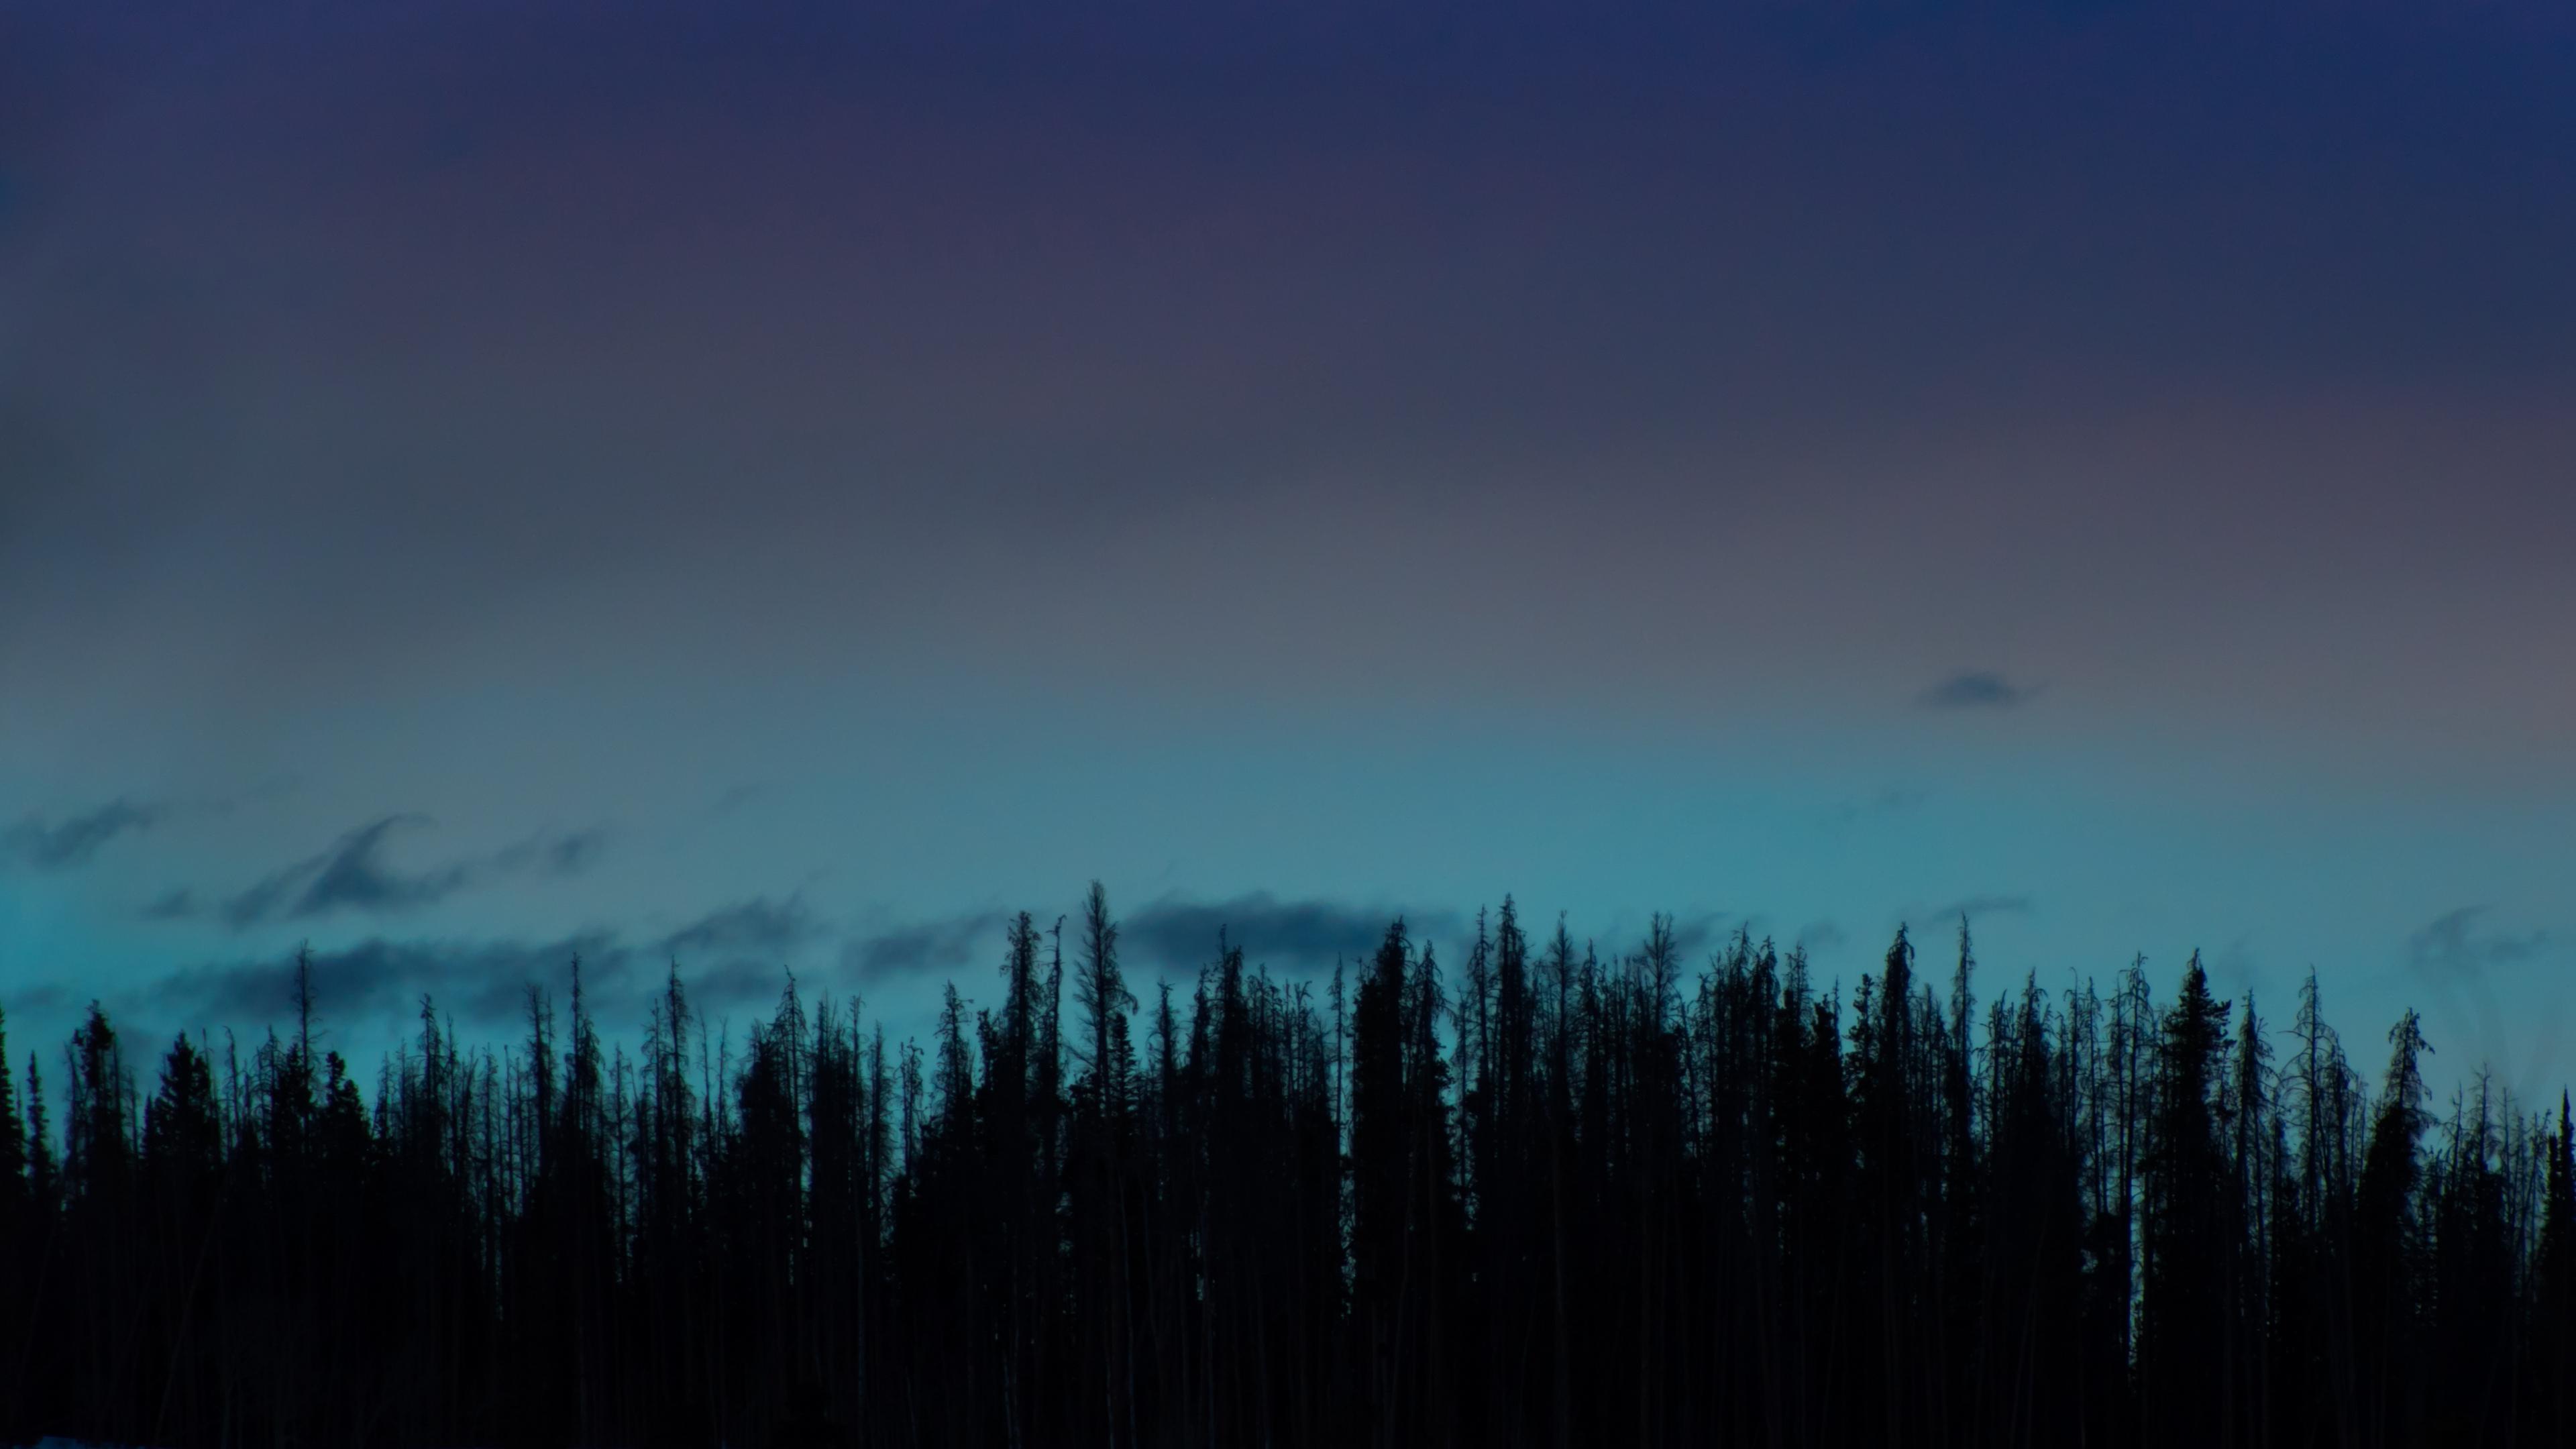 trees night sky 4k 1541114600 - trees, night, sky 4k - Trees, Sky, Night